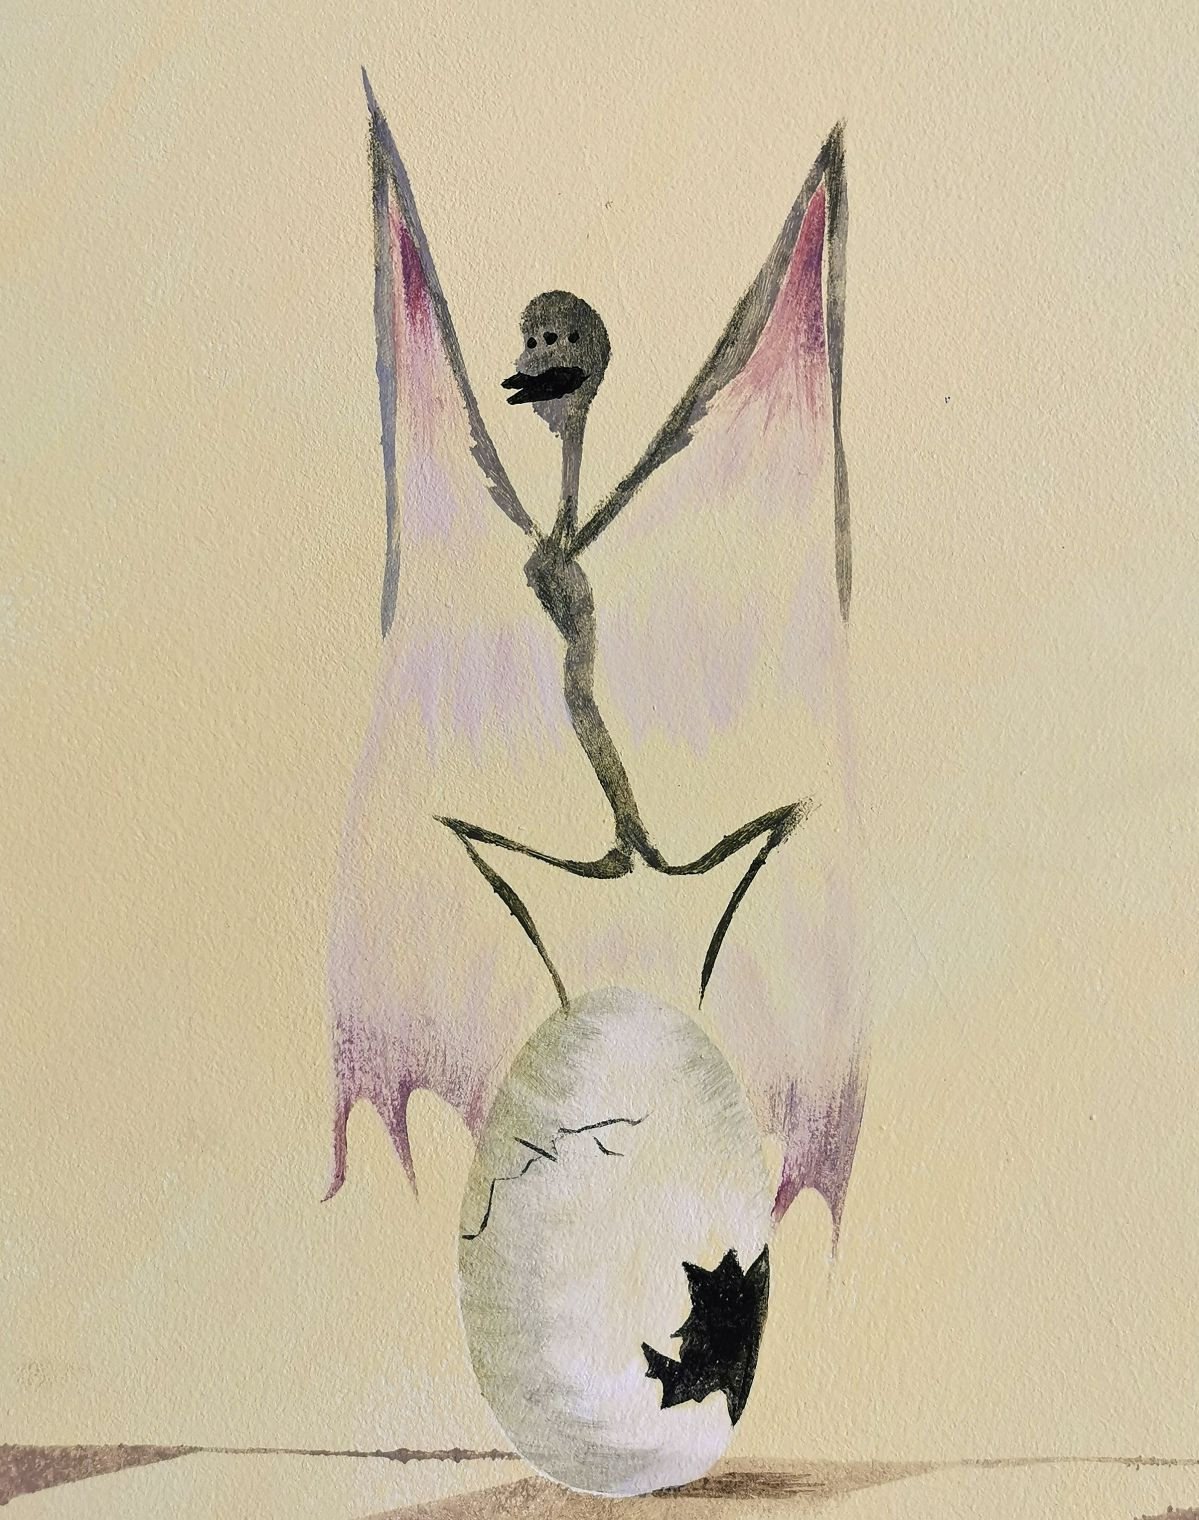 Alison Yip - House of Sobbing Orchids, 2021 - Fly, Robin, Fly - Mécènes du sud Montpllier-Sète